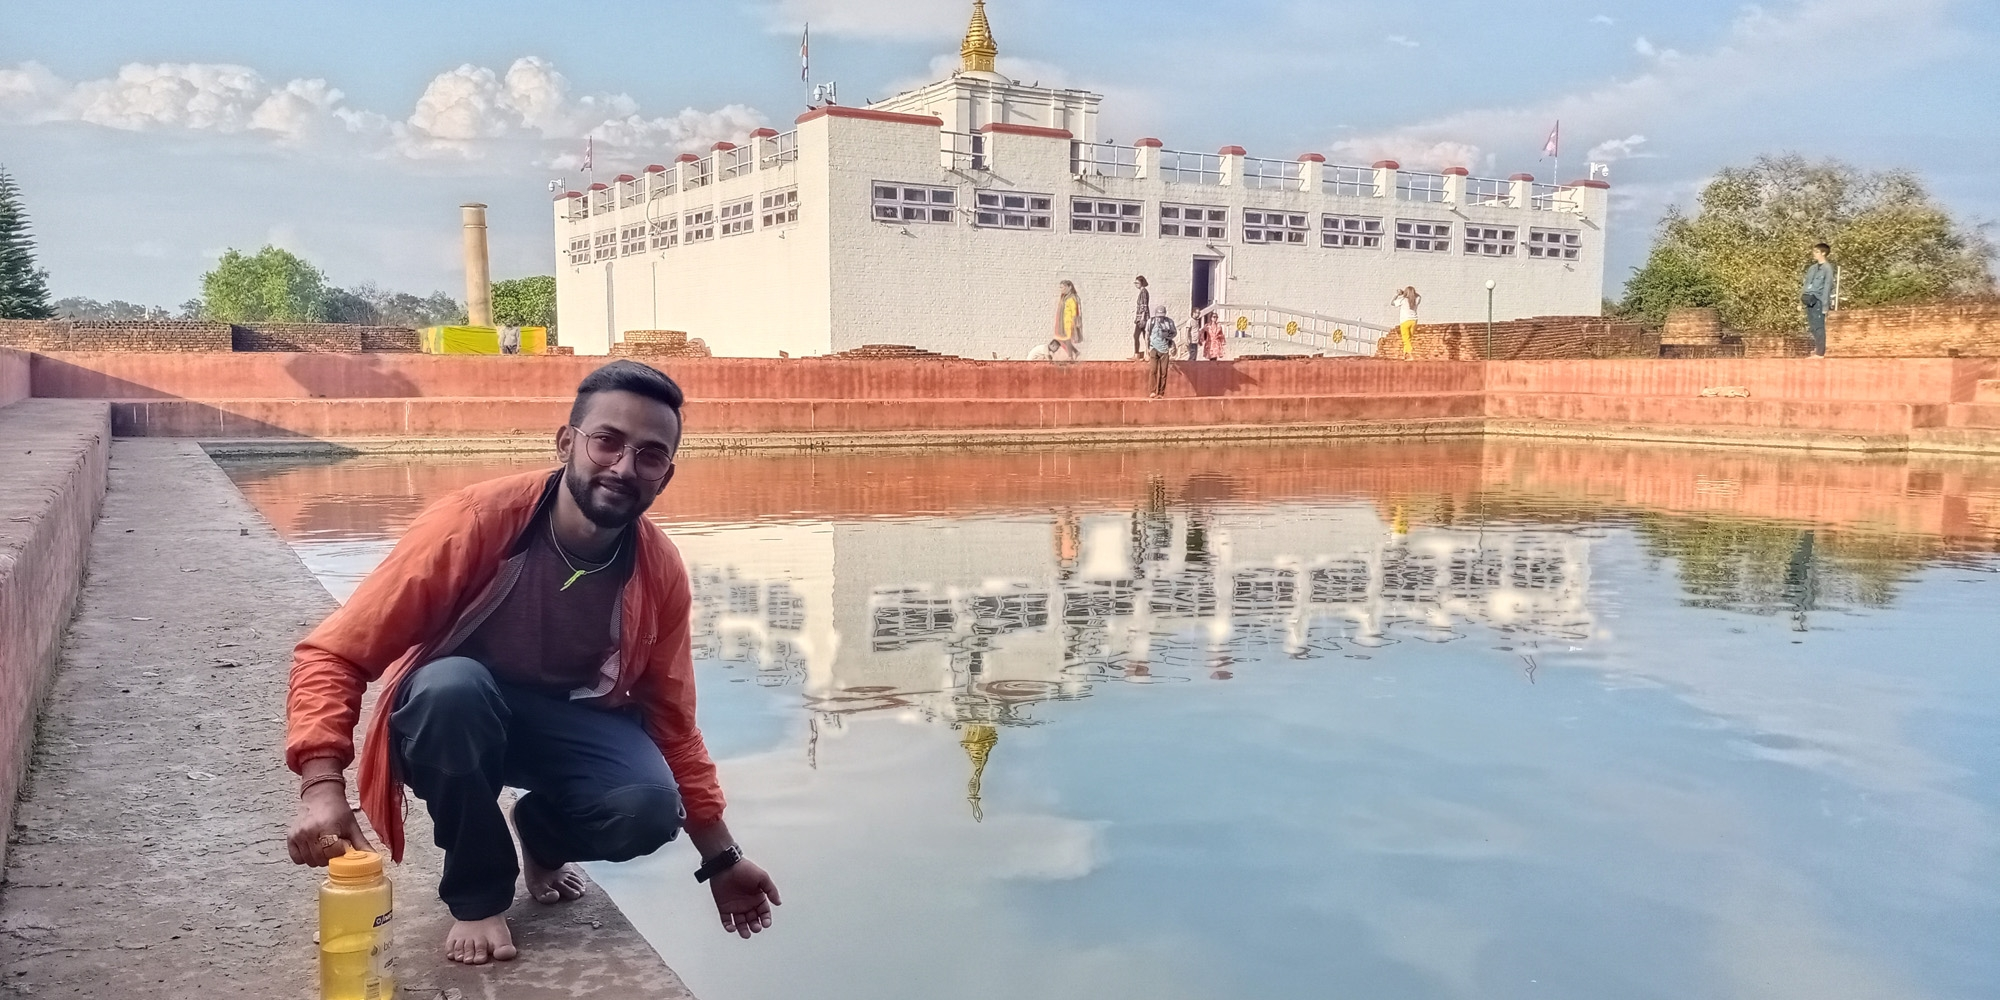 Kathmandu-Pokhara-Chitwan-Lumbini Tours